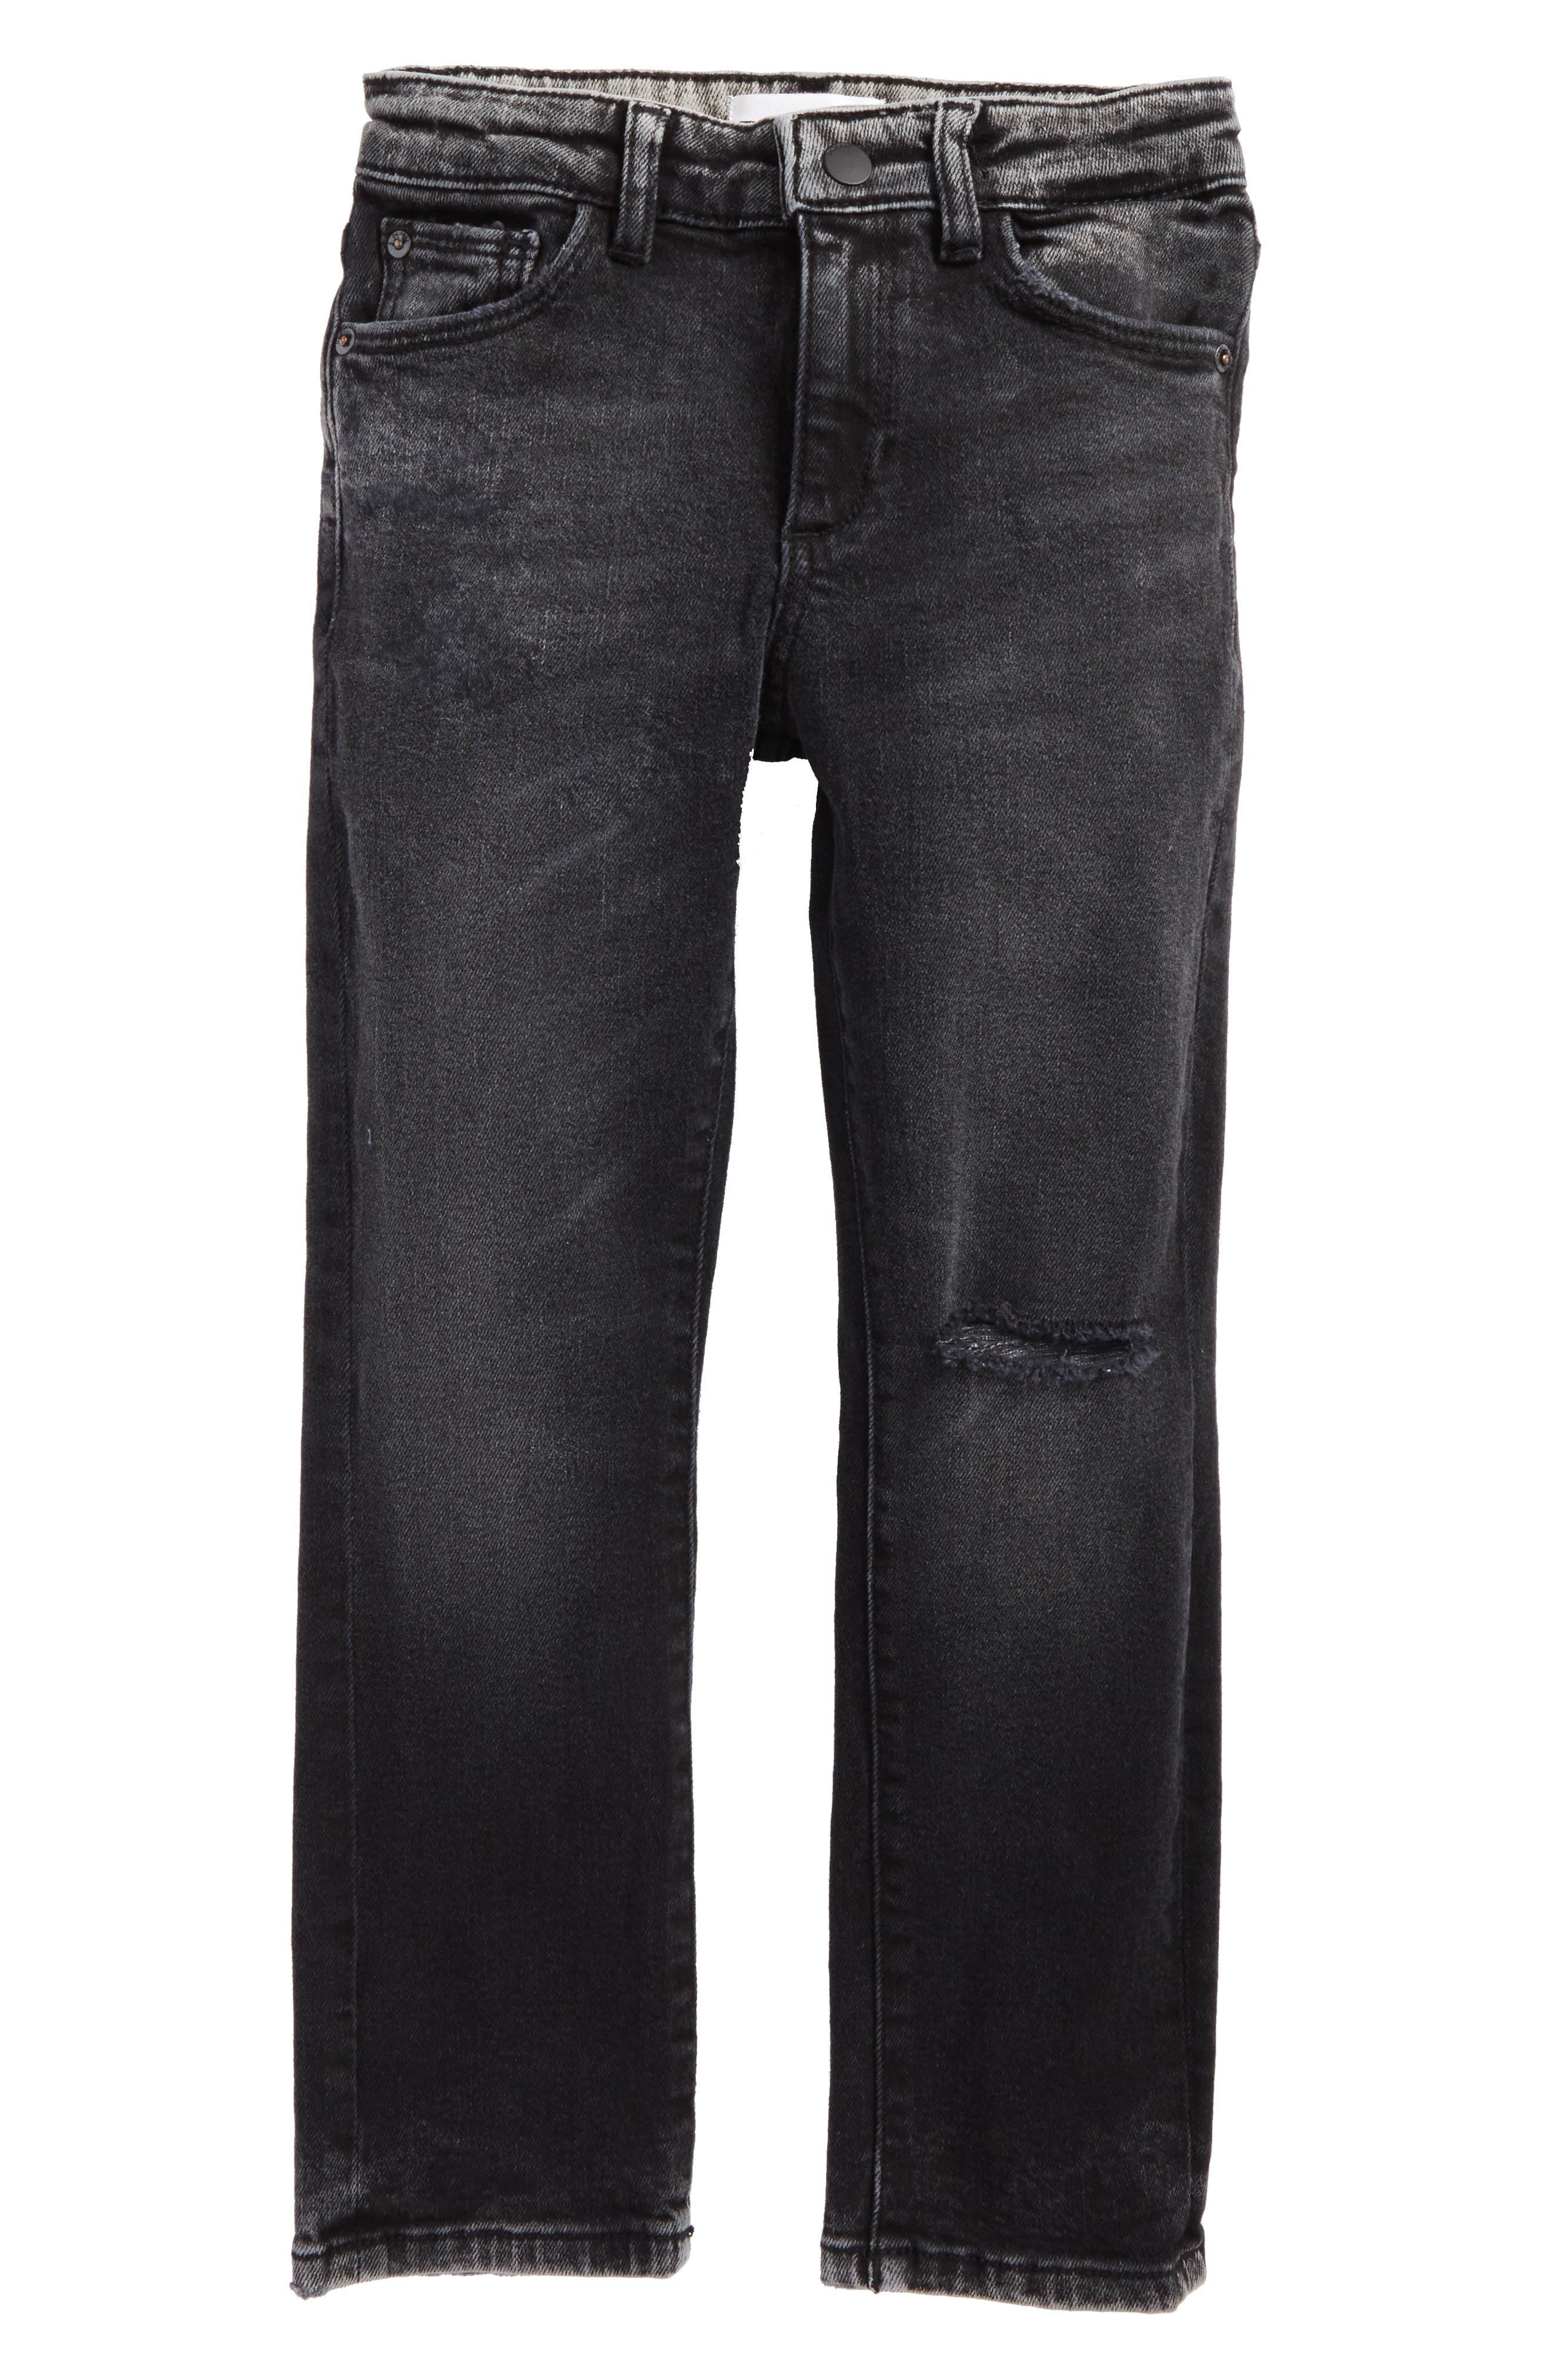 Alternate Image 1 Selected - DL1961 Hawke Skinny Jeans (Toddler Boys & Little Boys)